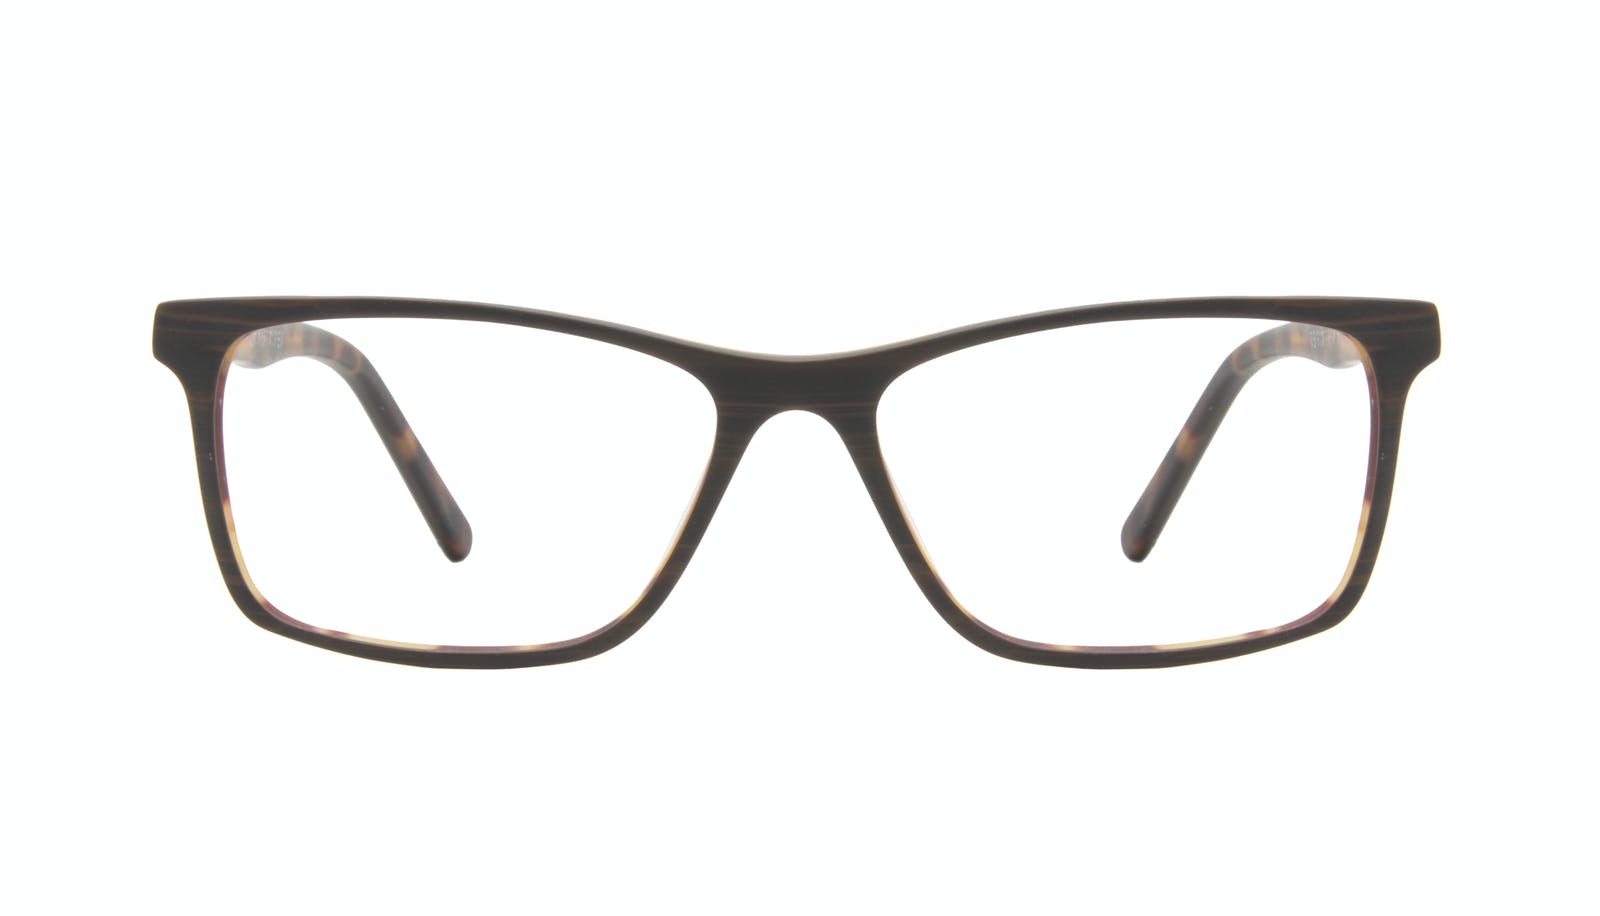 d2a7f1371f Affordable Fashion Glasses Rectangle Eyeglasses Men Henri Brown Stripes